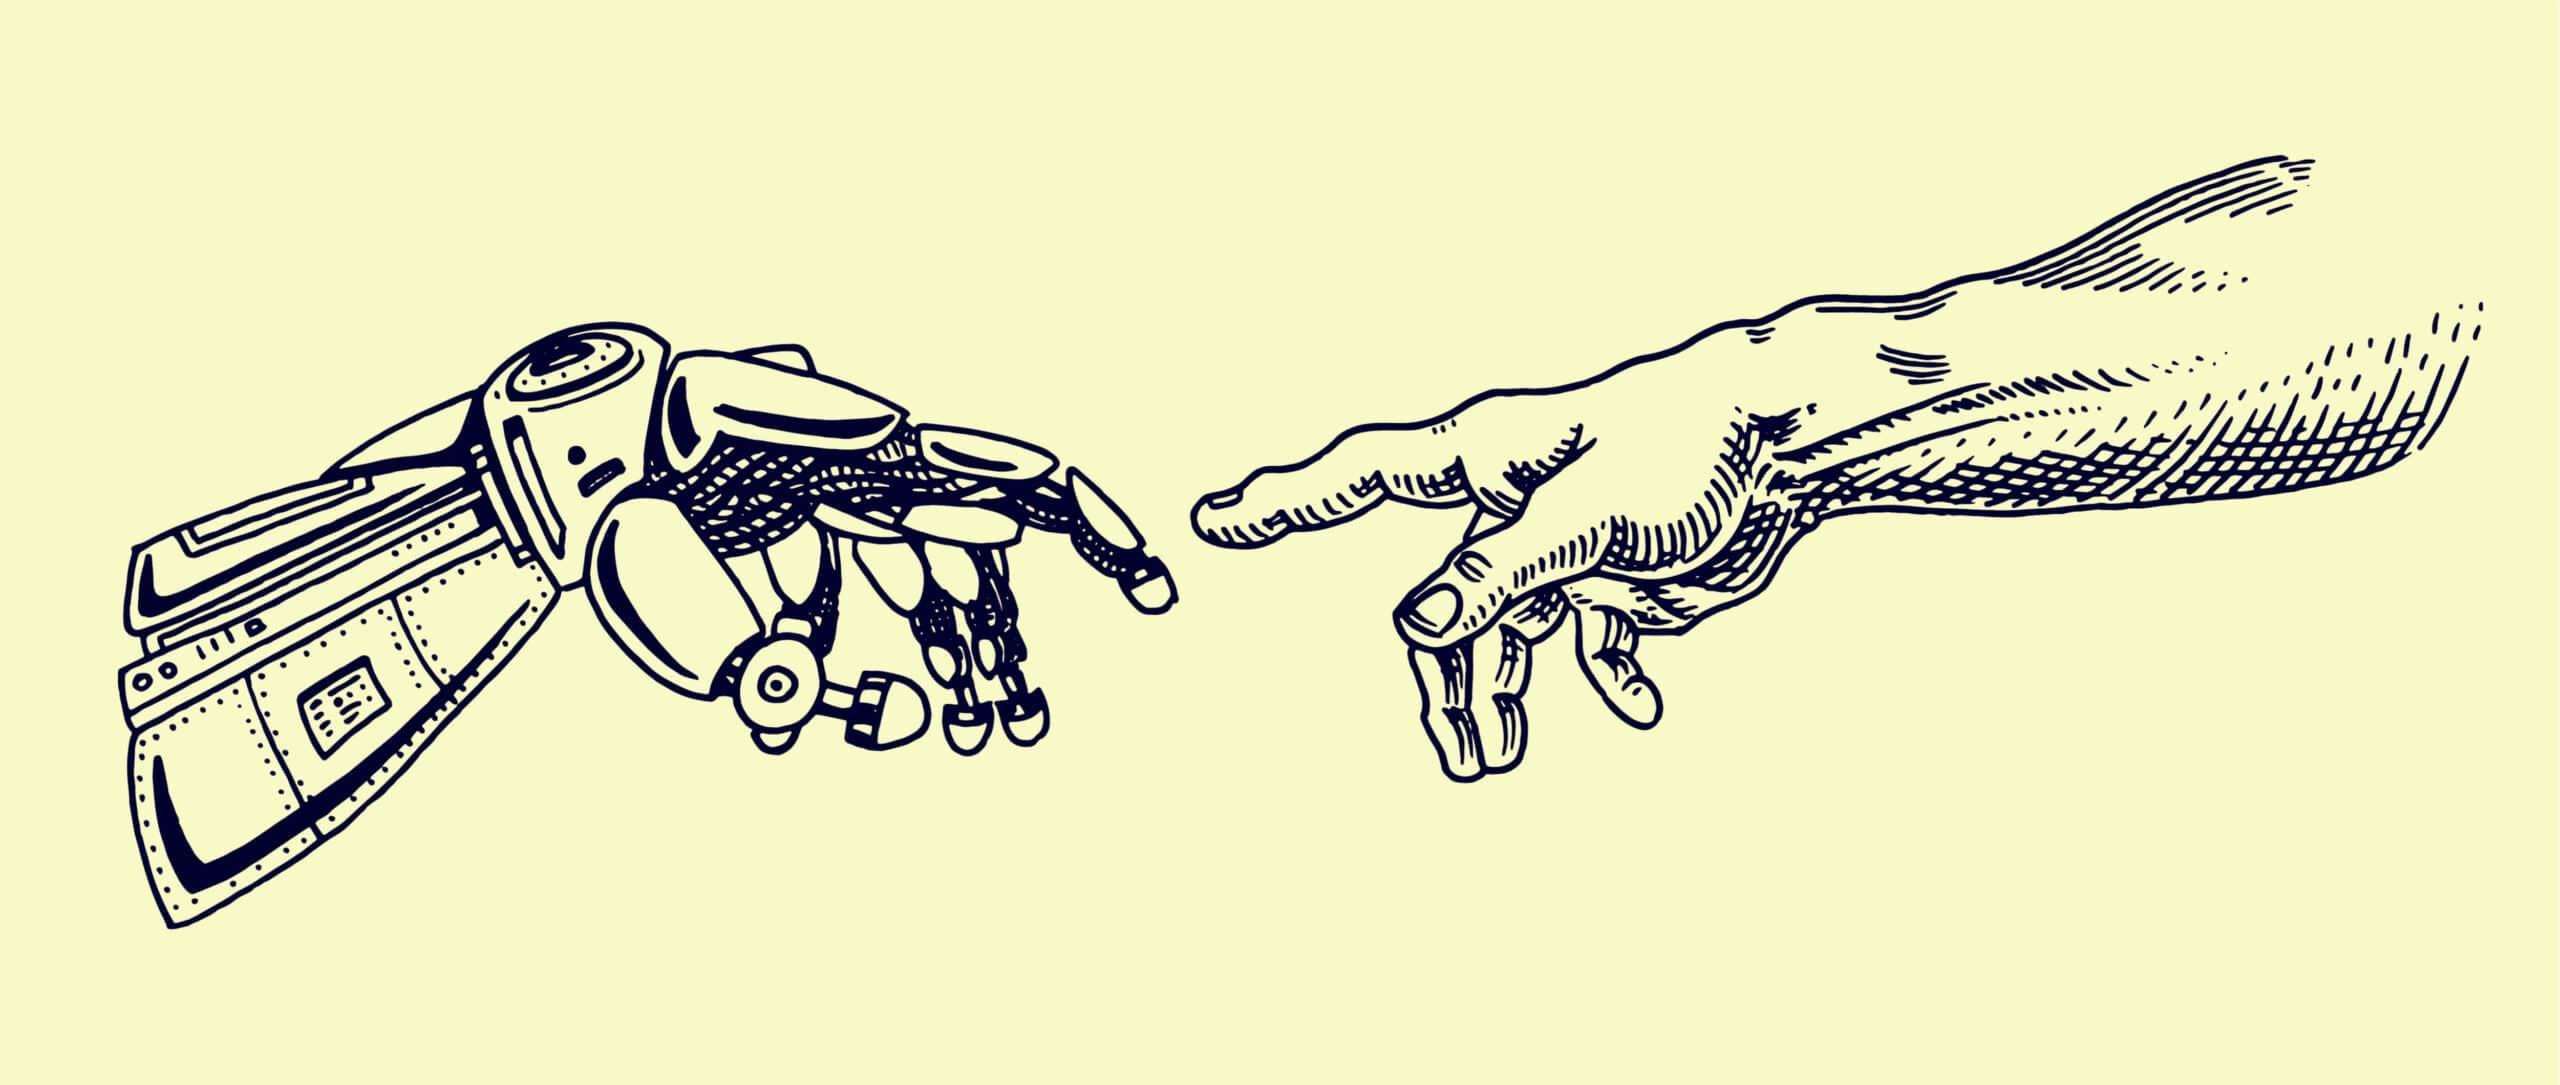 digital twinning vs real life scenarios